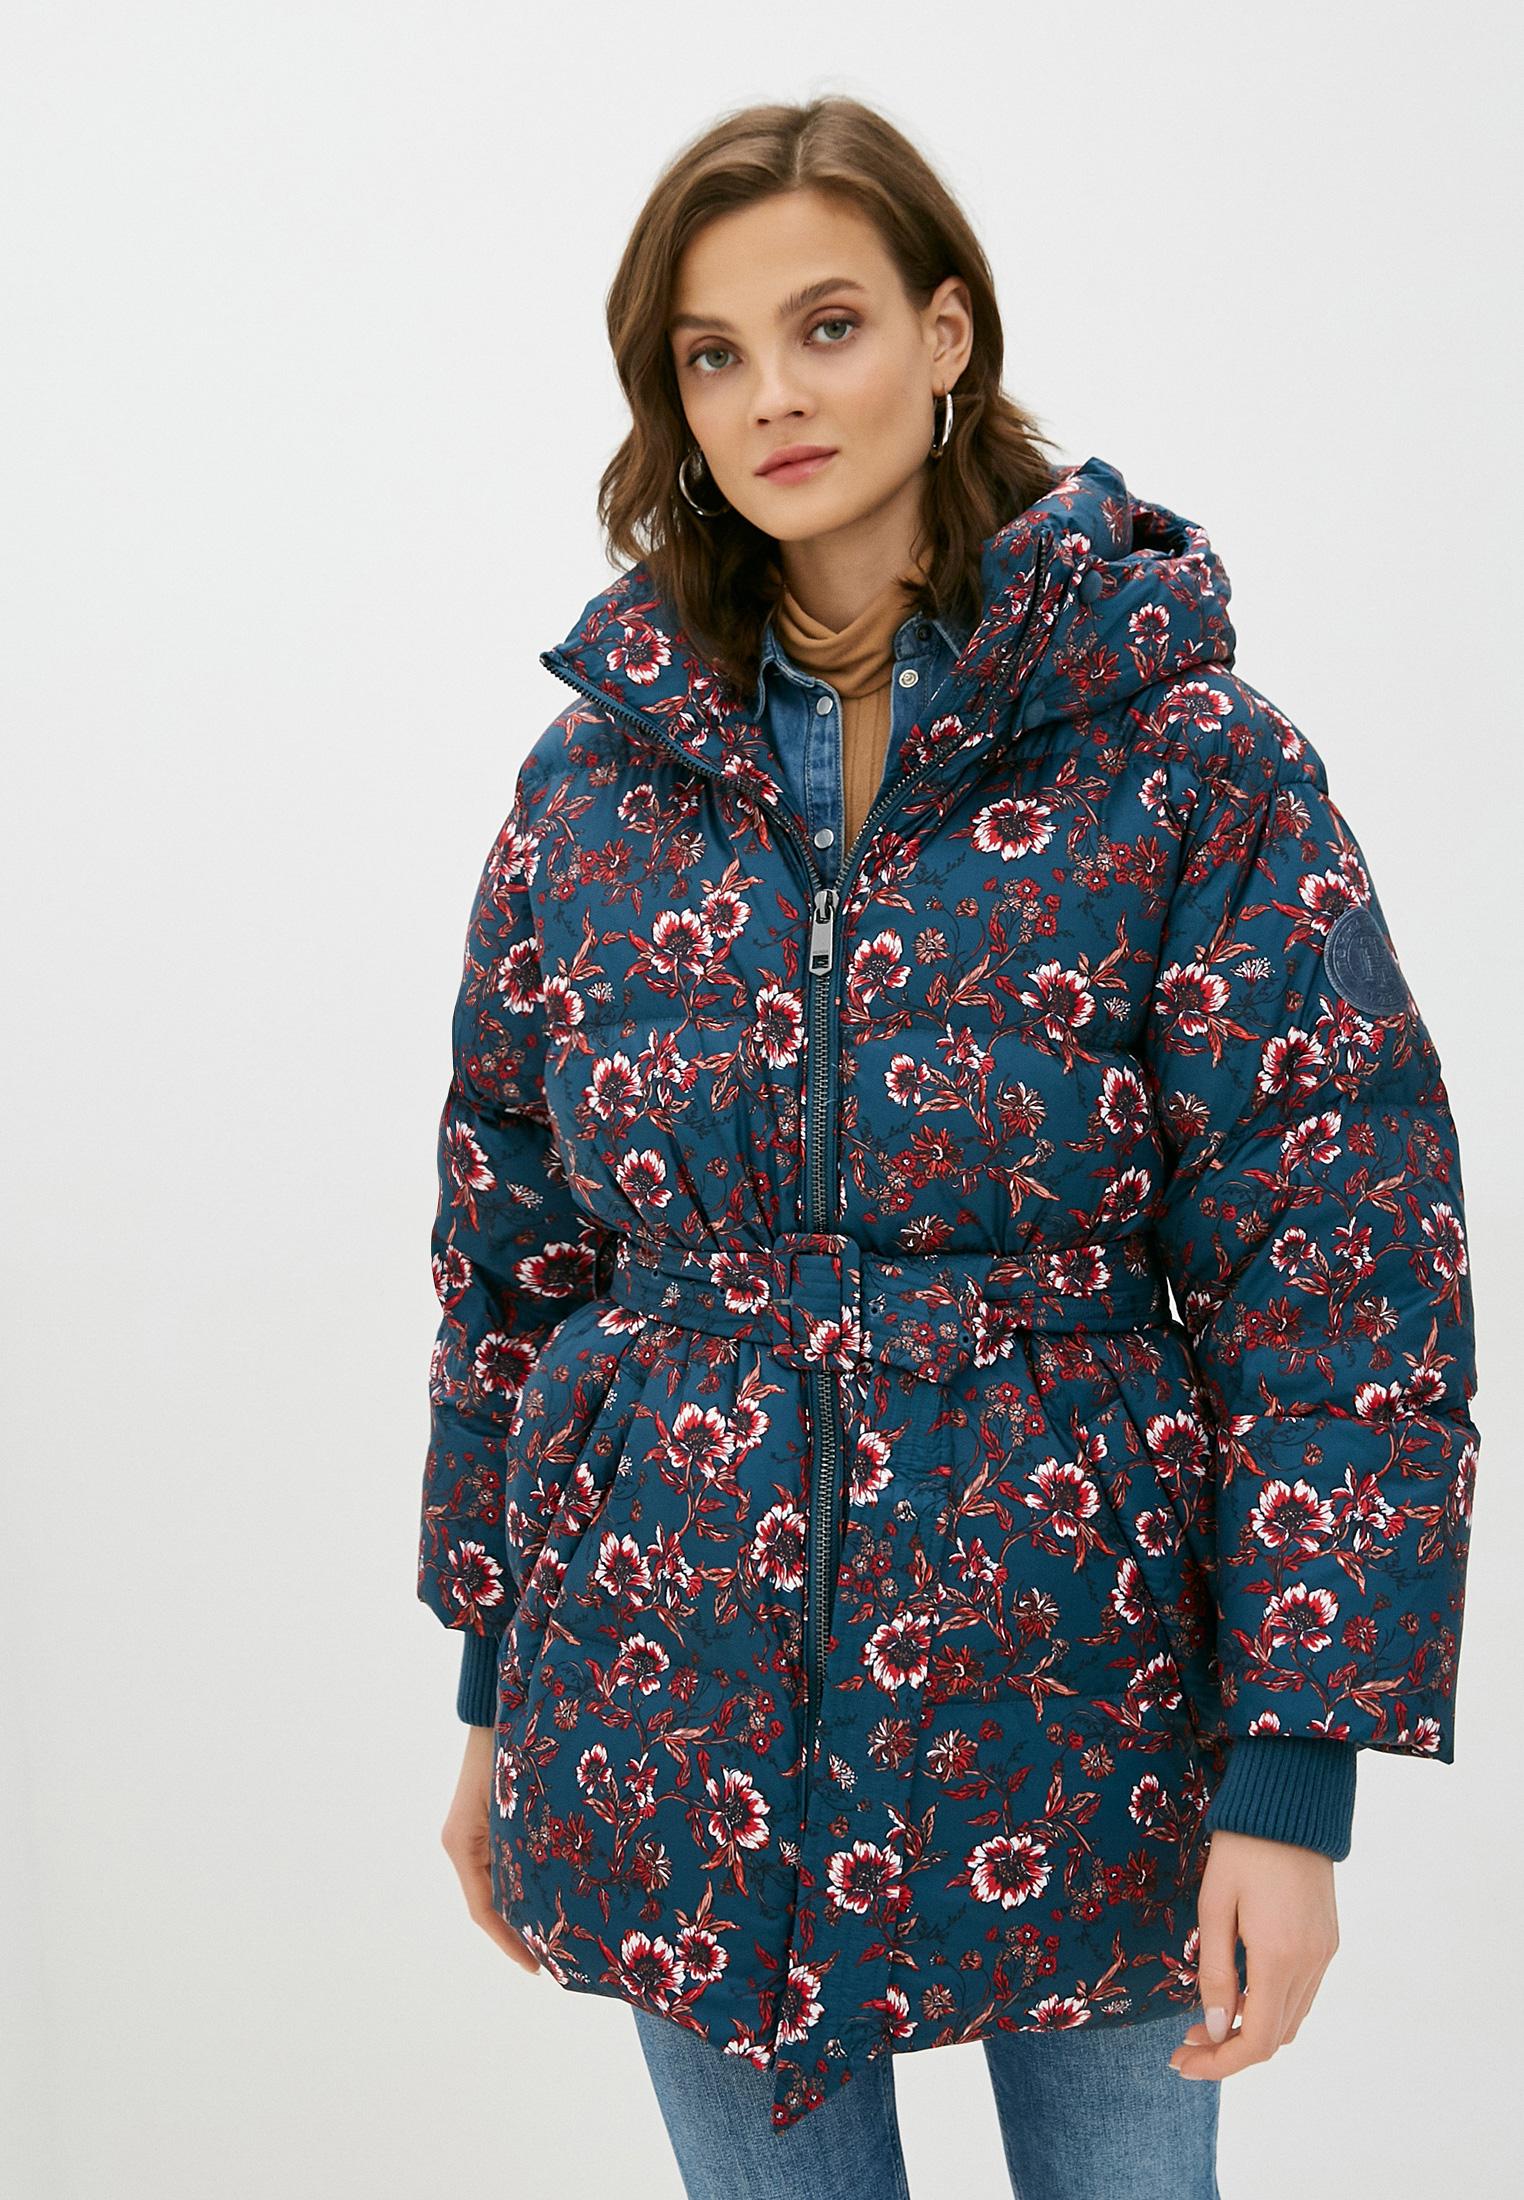 Утепленная куртка Tommy Hilfiger (Томми Хилфигер) WW0WW29334